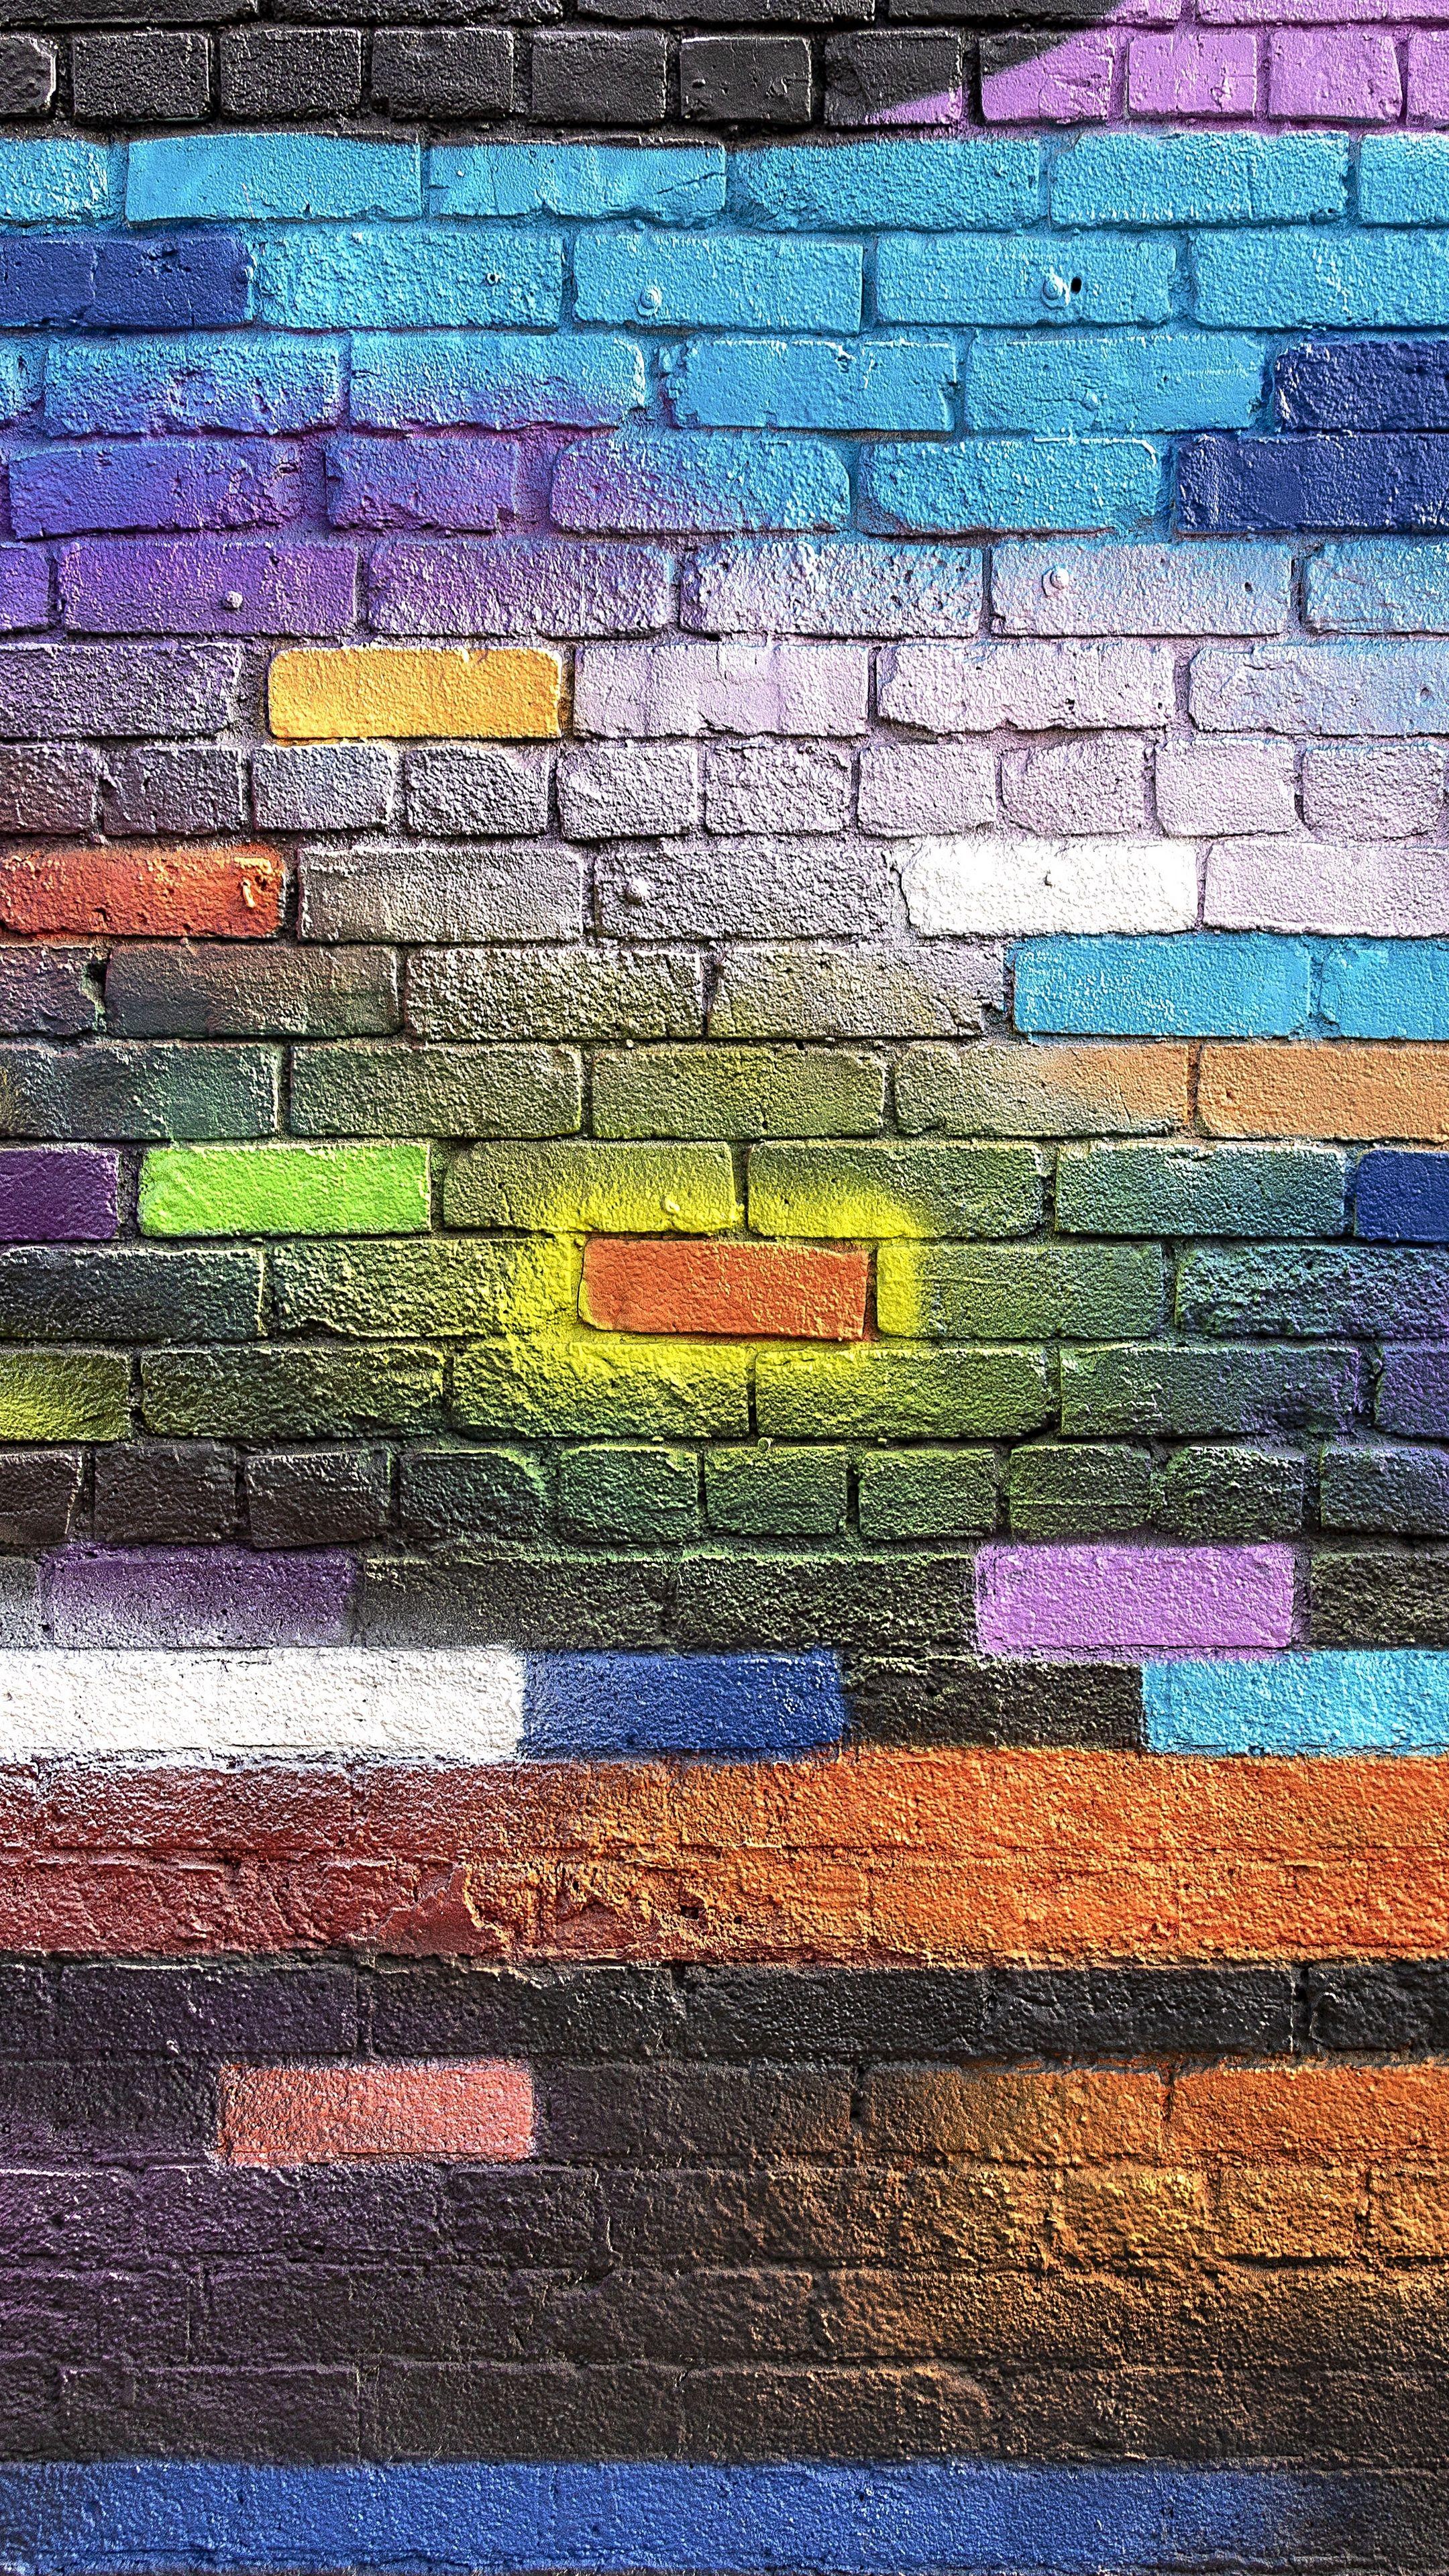 #Abstract #wall #brick #colorful #paint #streetart # ...